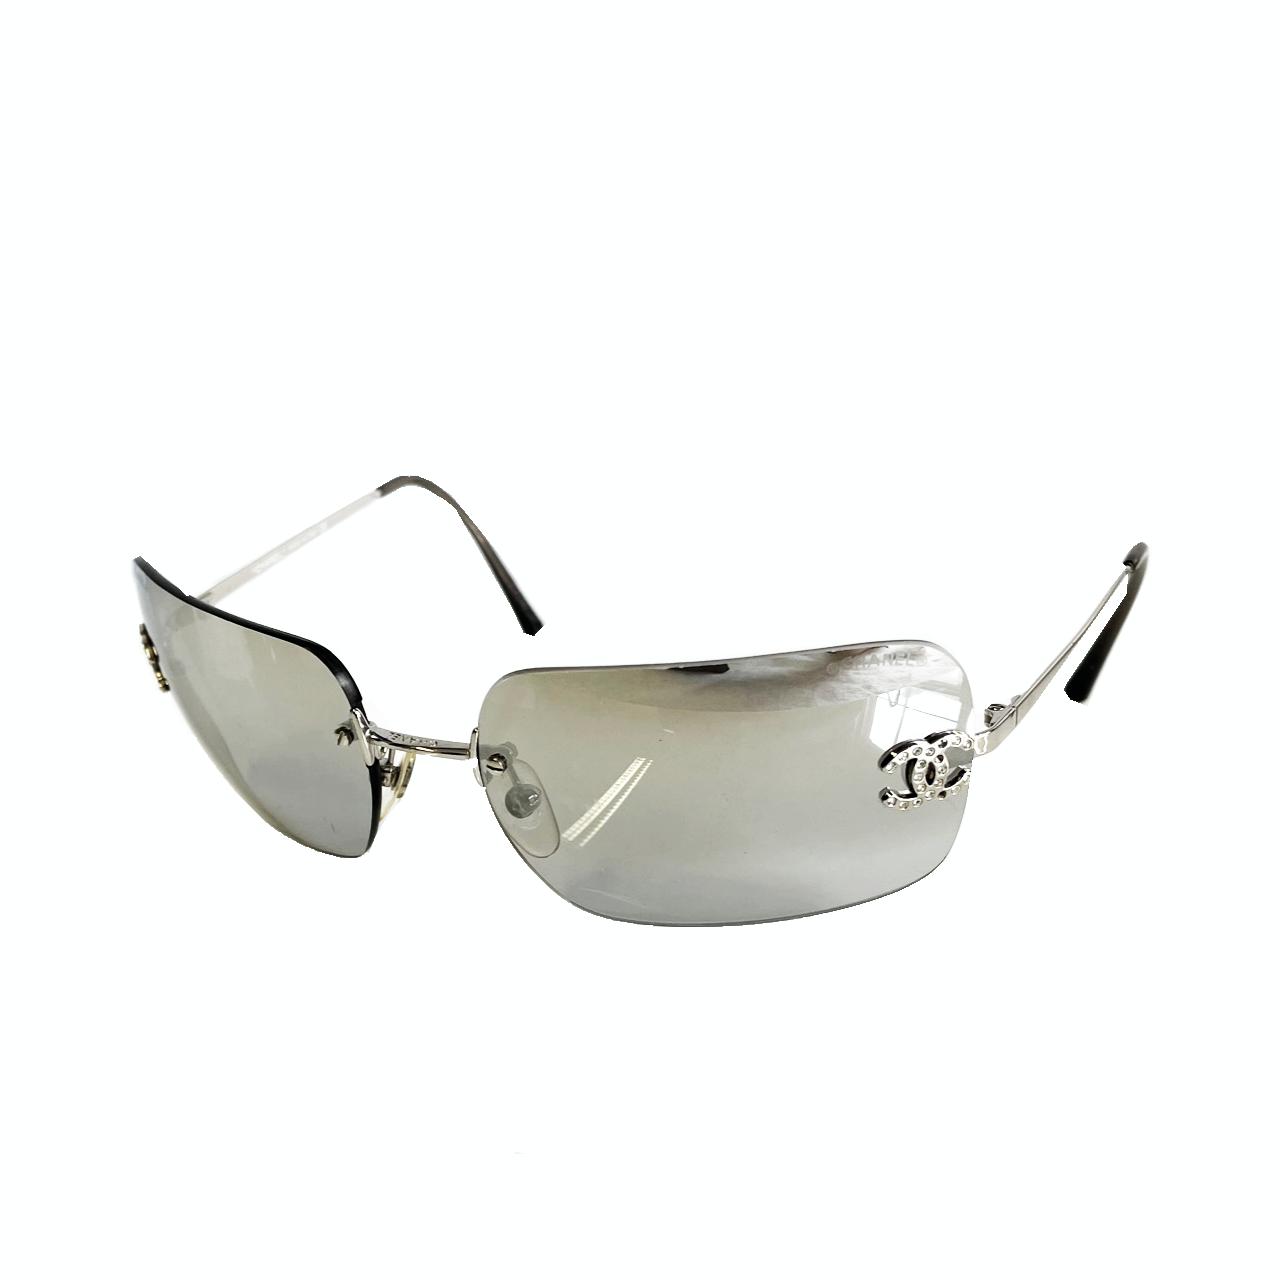 Vintage Chanel Rimless Diamante Sunglasses in Grey   NITRYL